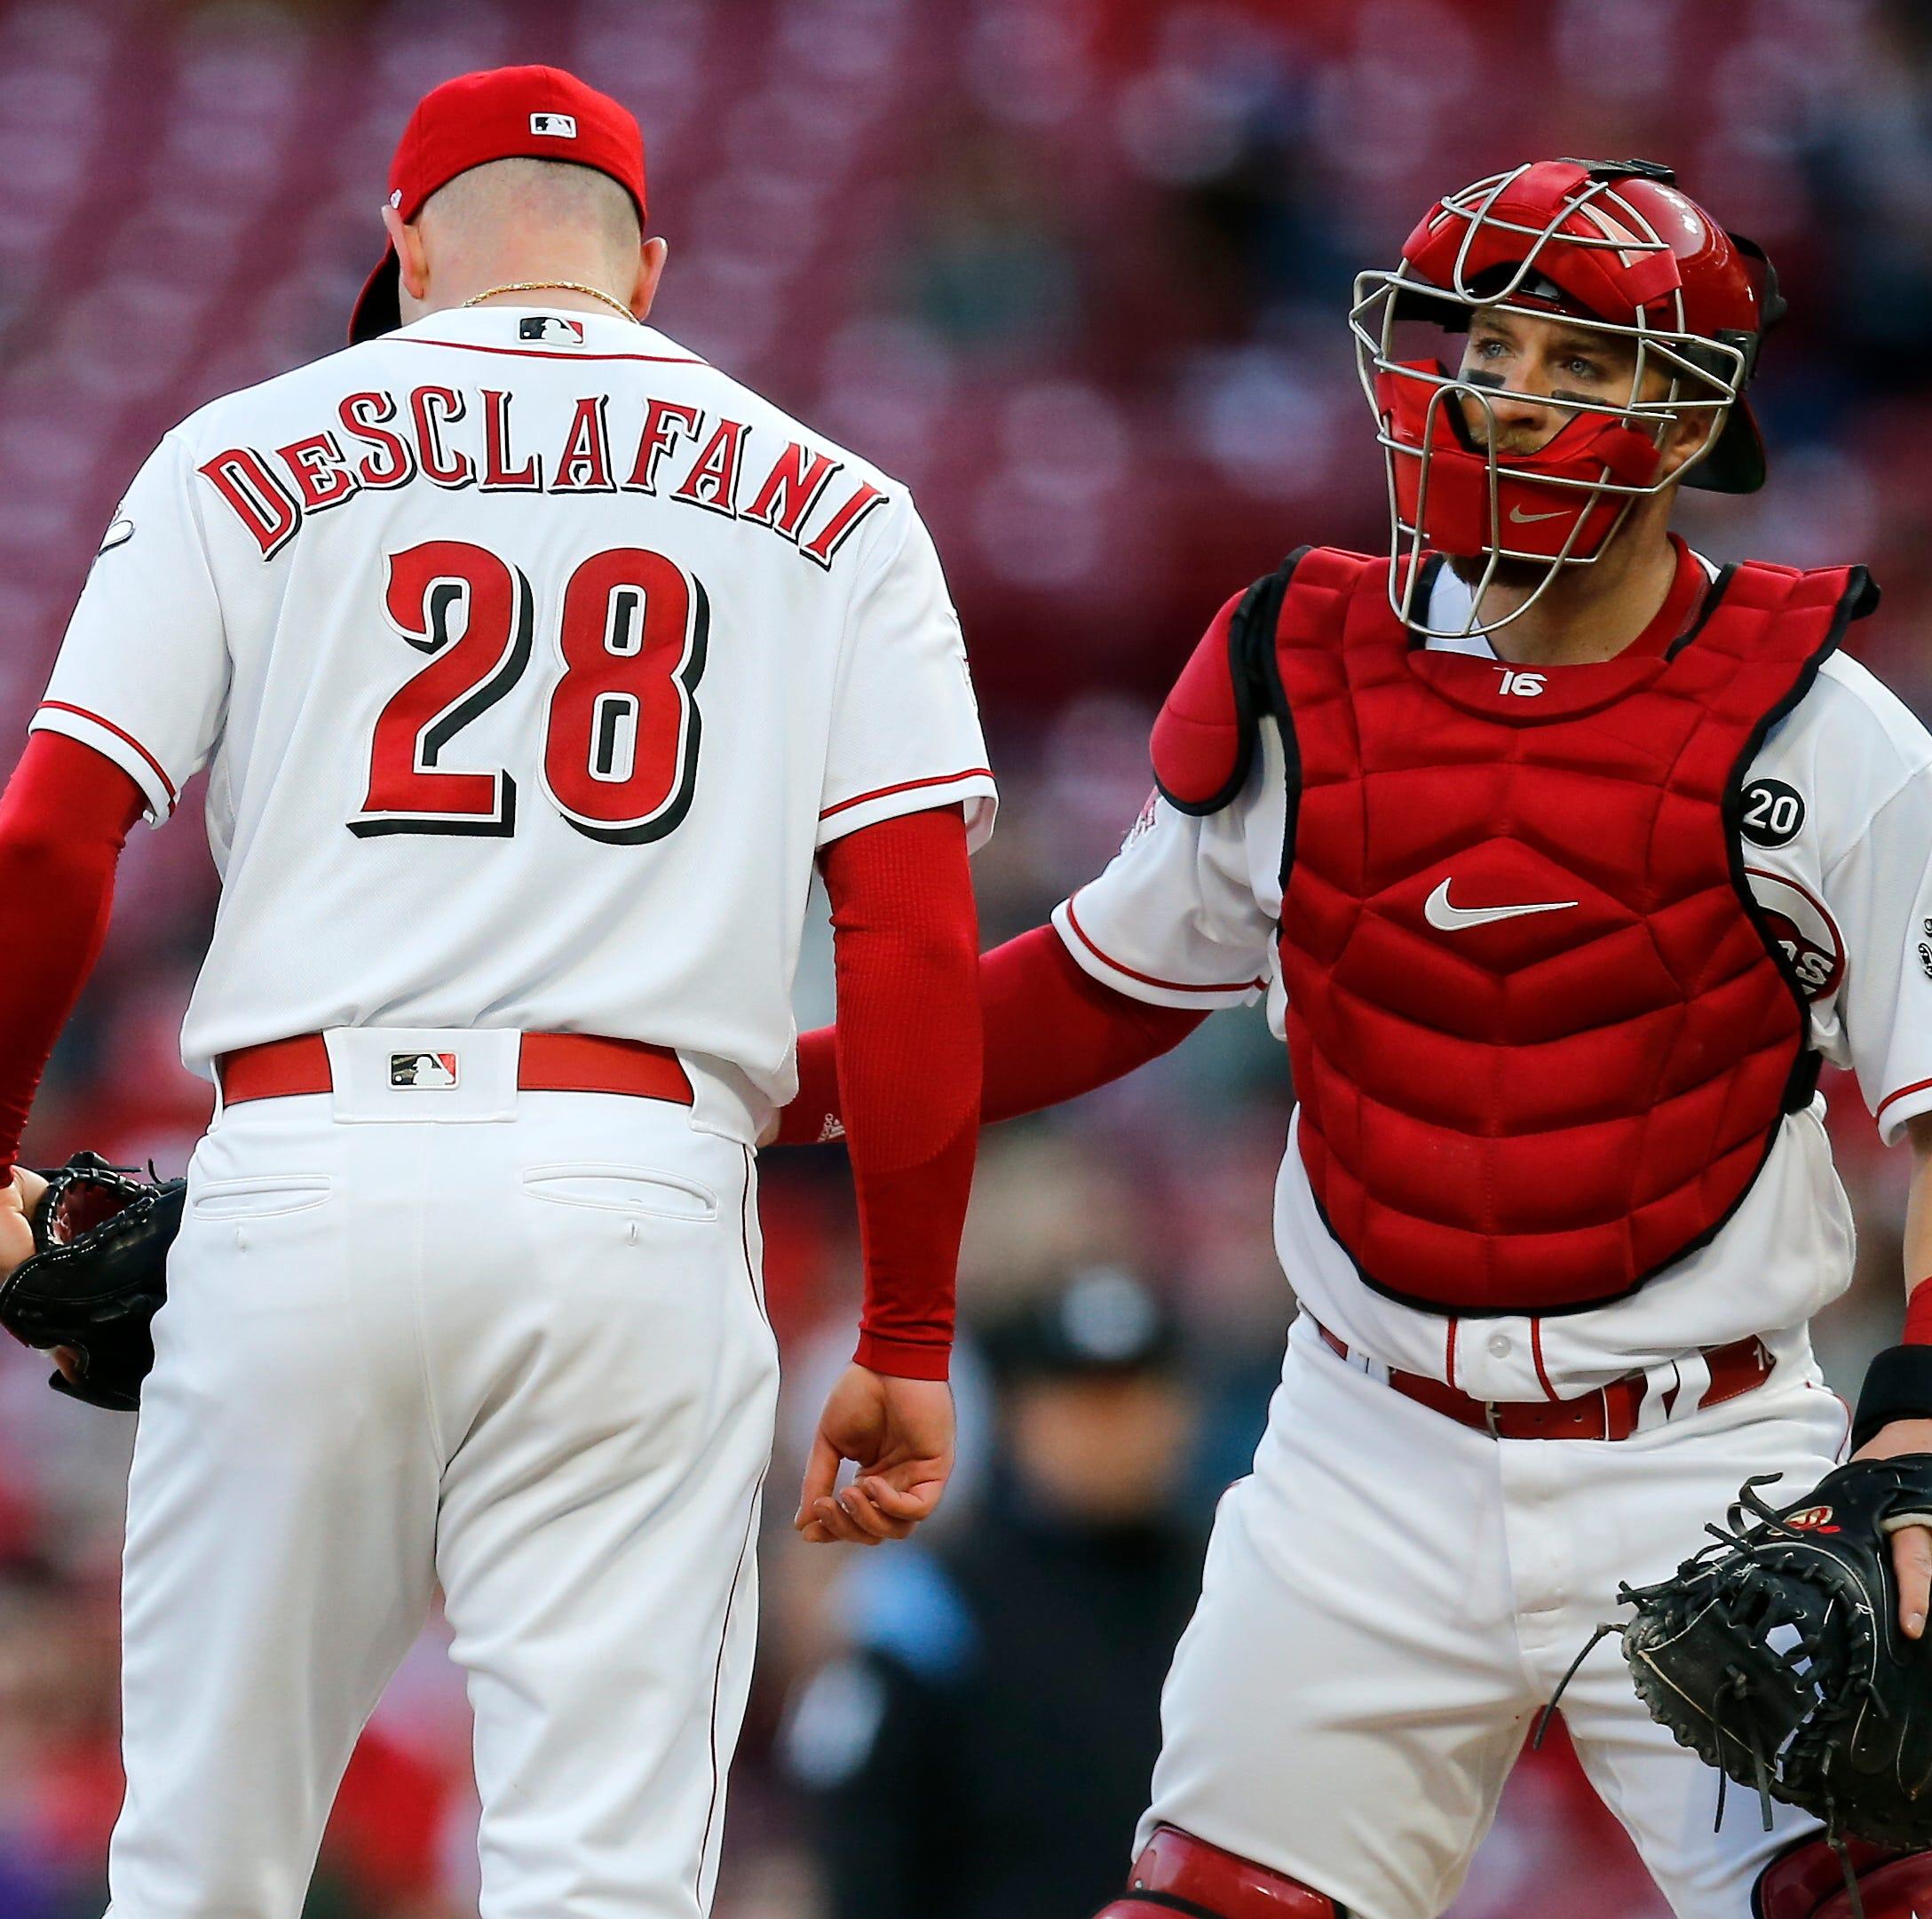 Orlando Arcia's 3-run homer drops the Cincinnati Reds in a 4-3 loss to Milwaukee Brewers